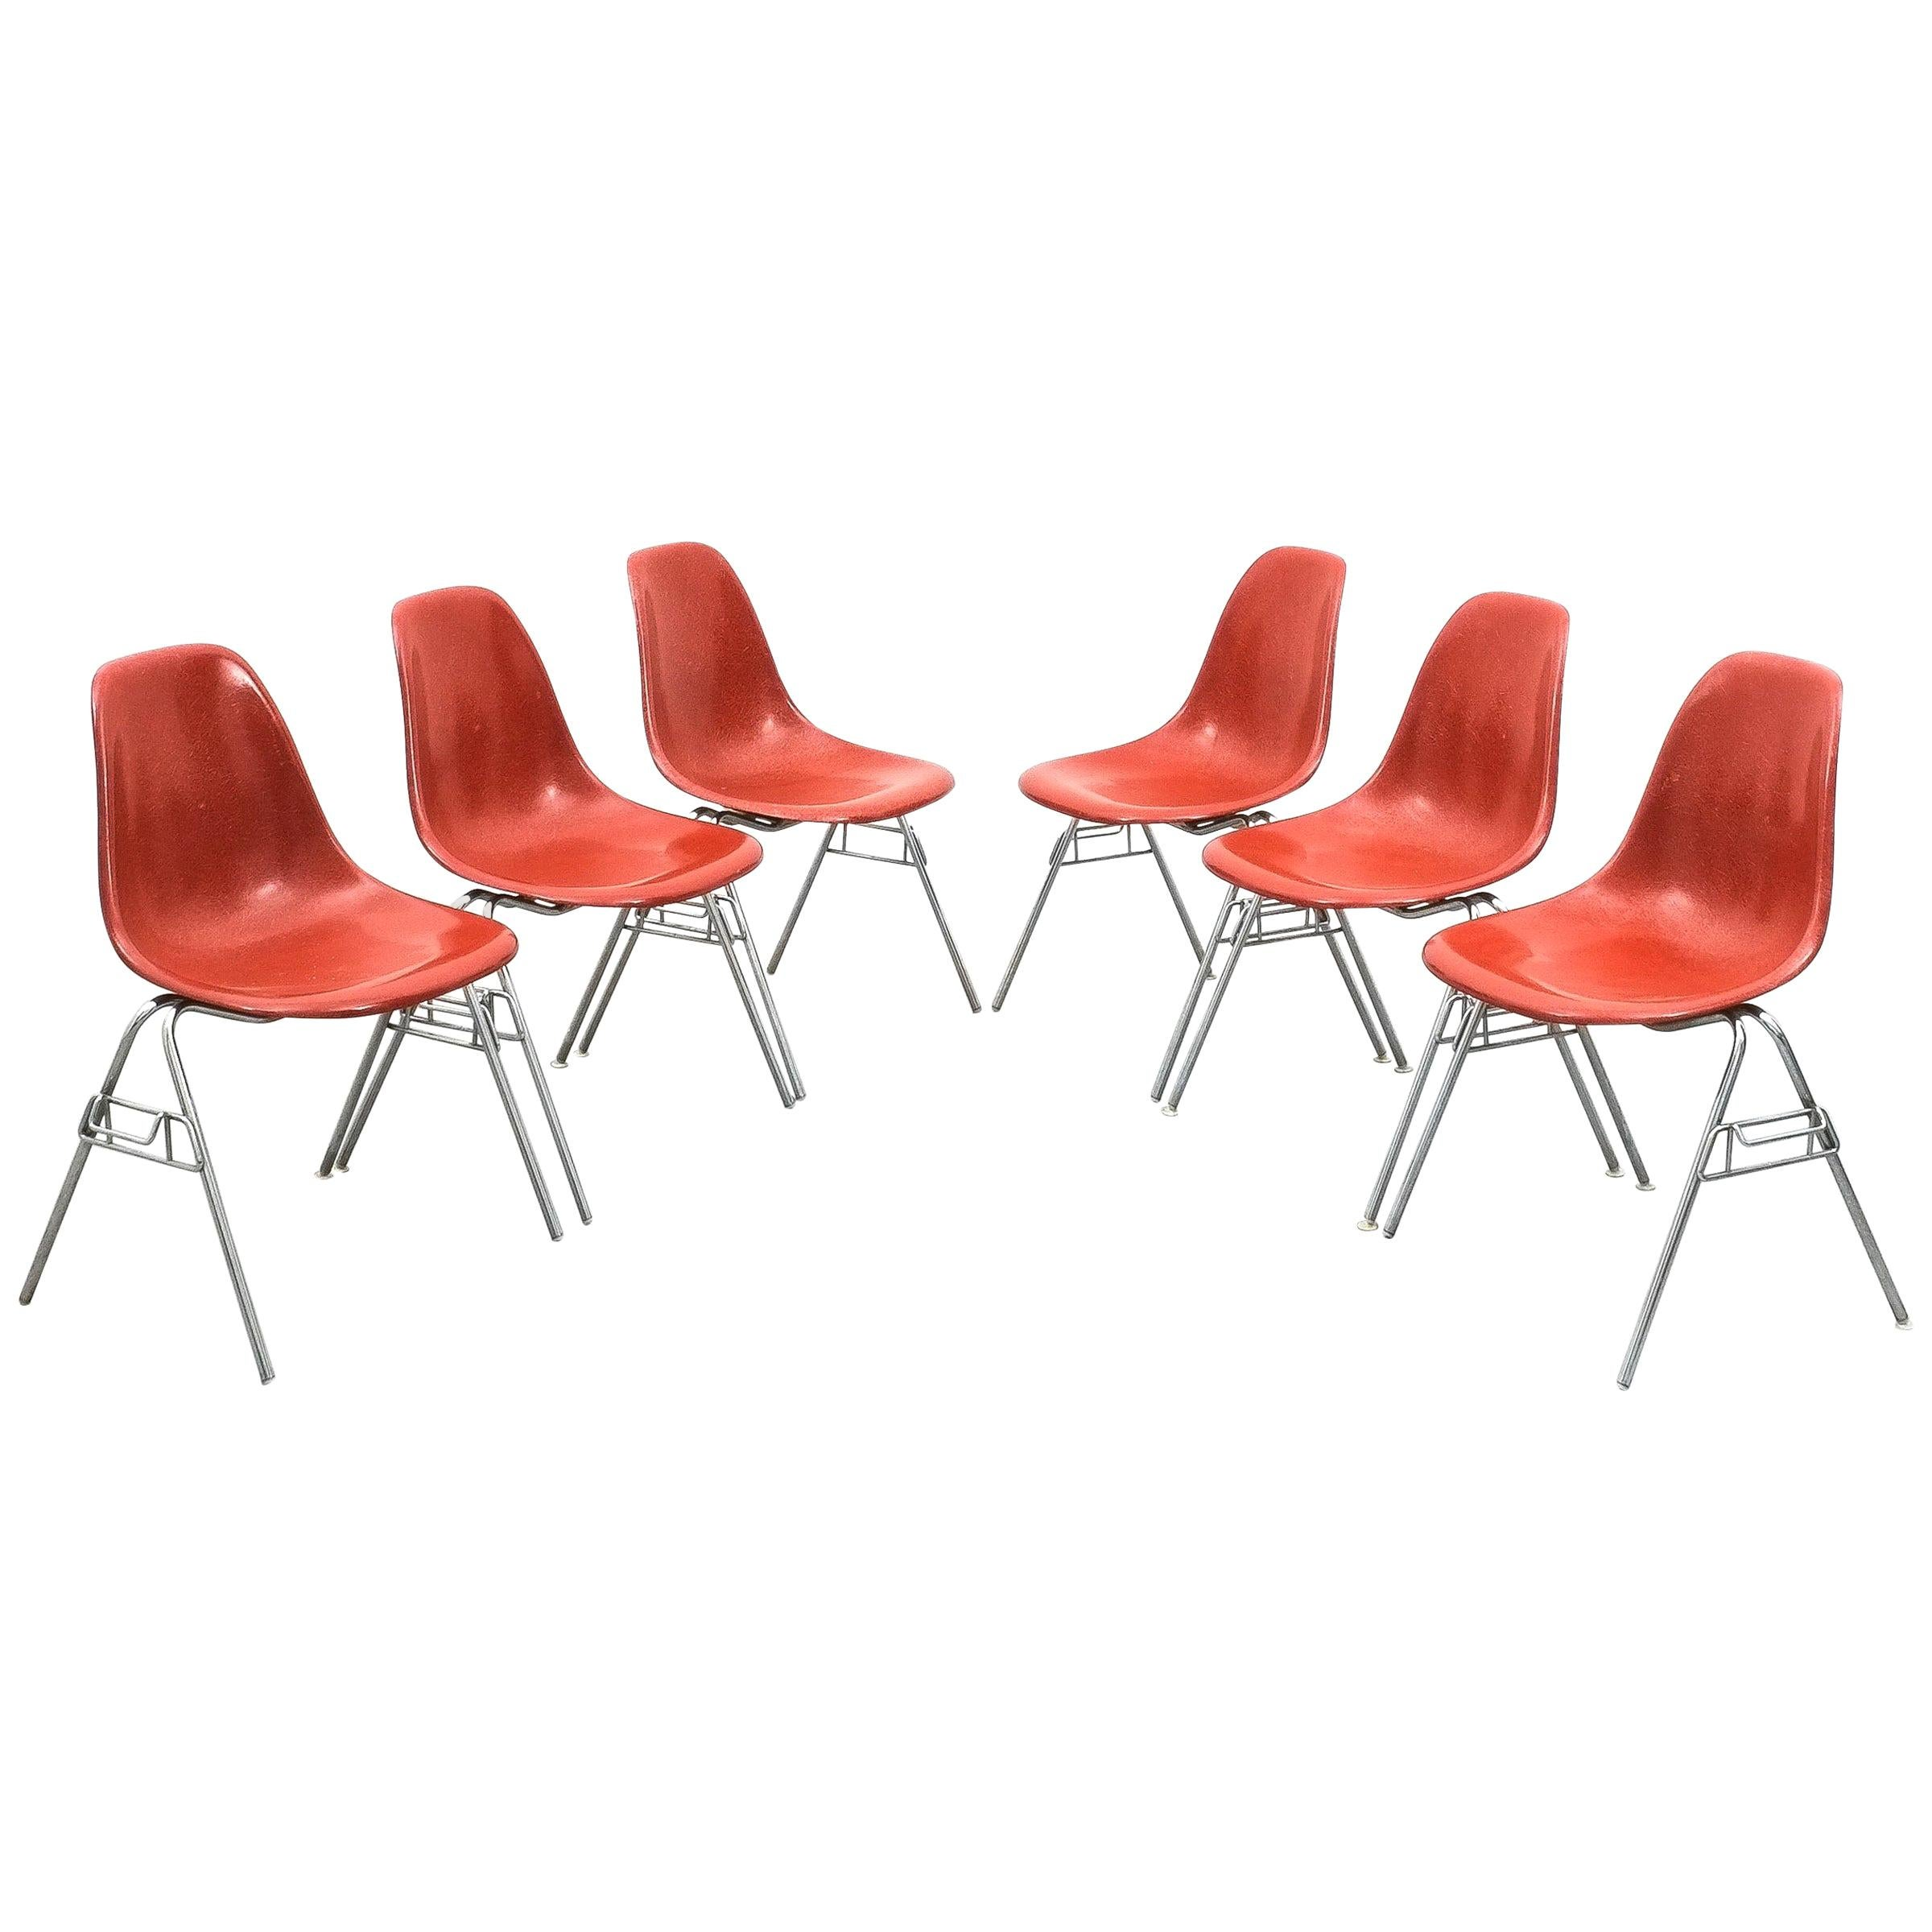 2 times Six Rare Herman Miller Eames Dining Chairs Terracotta, circa 1970